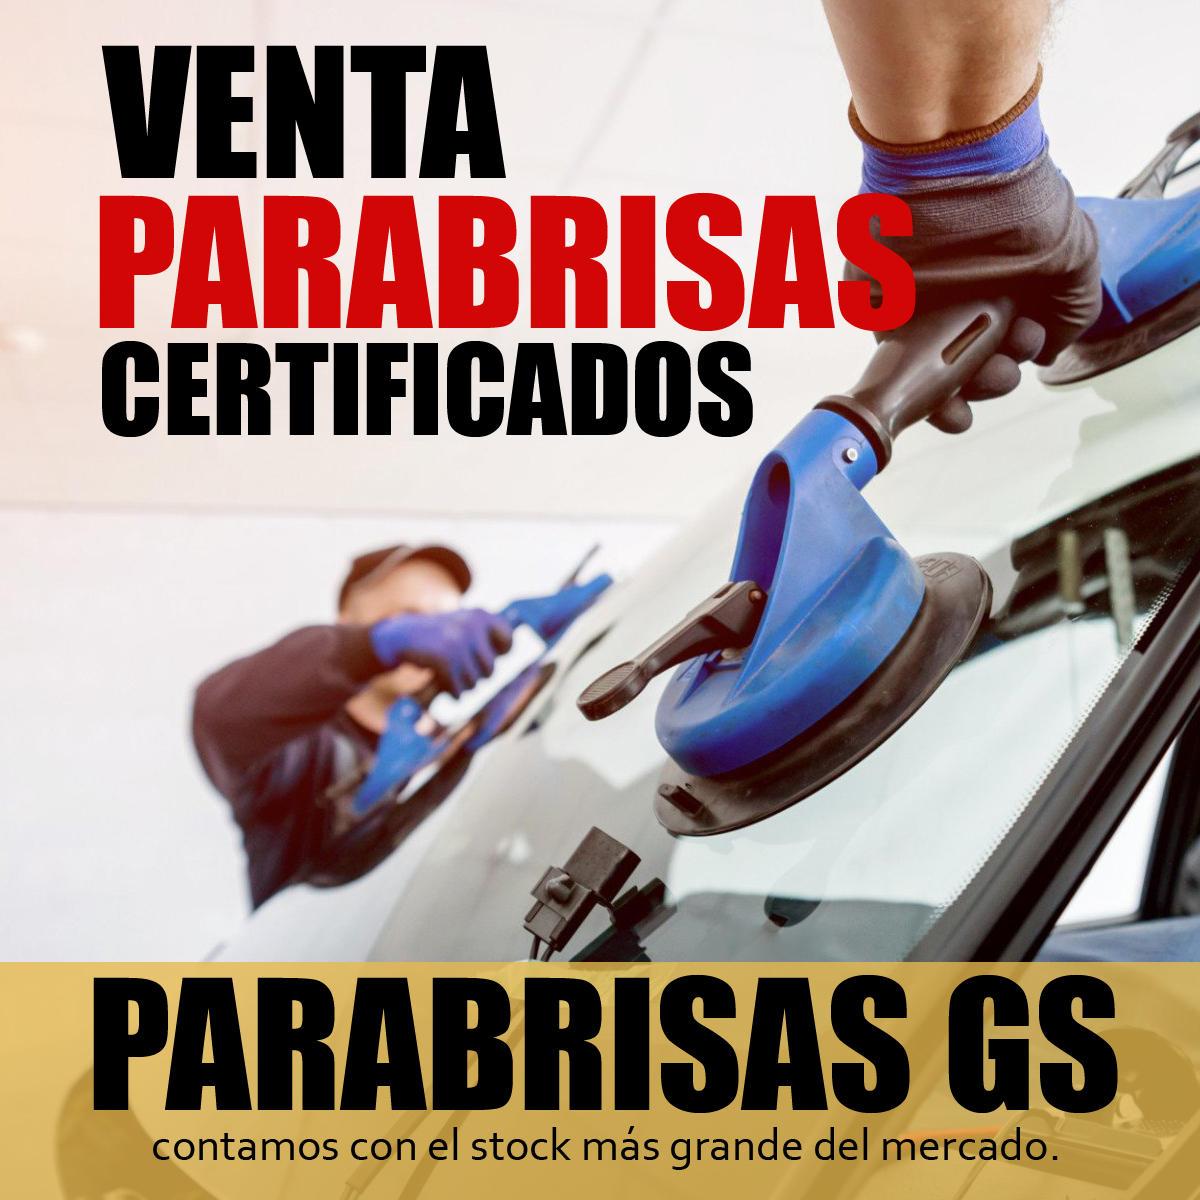 Parabrisas Gs